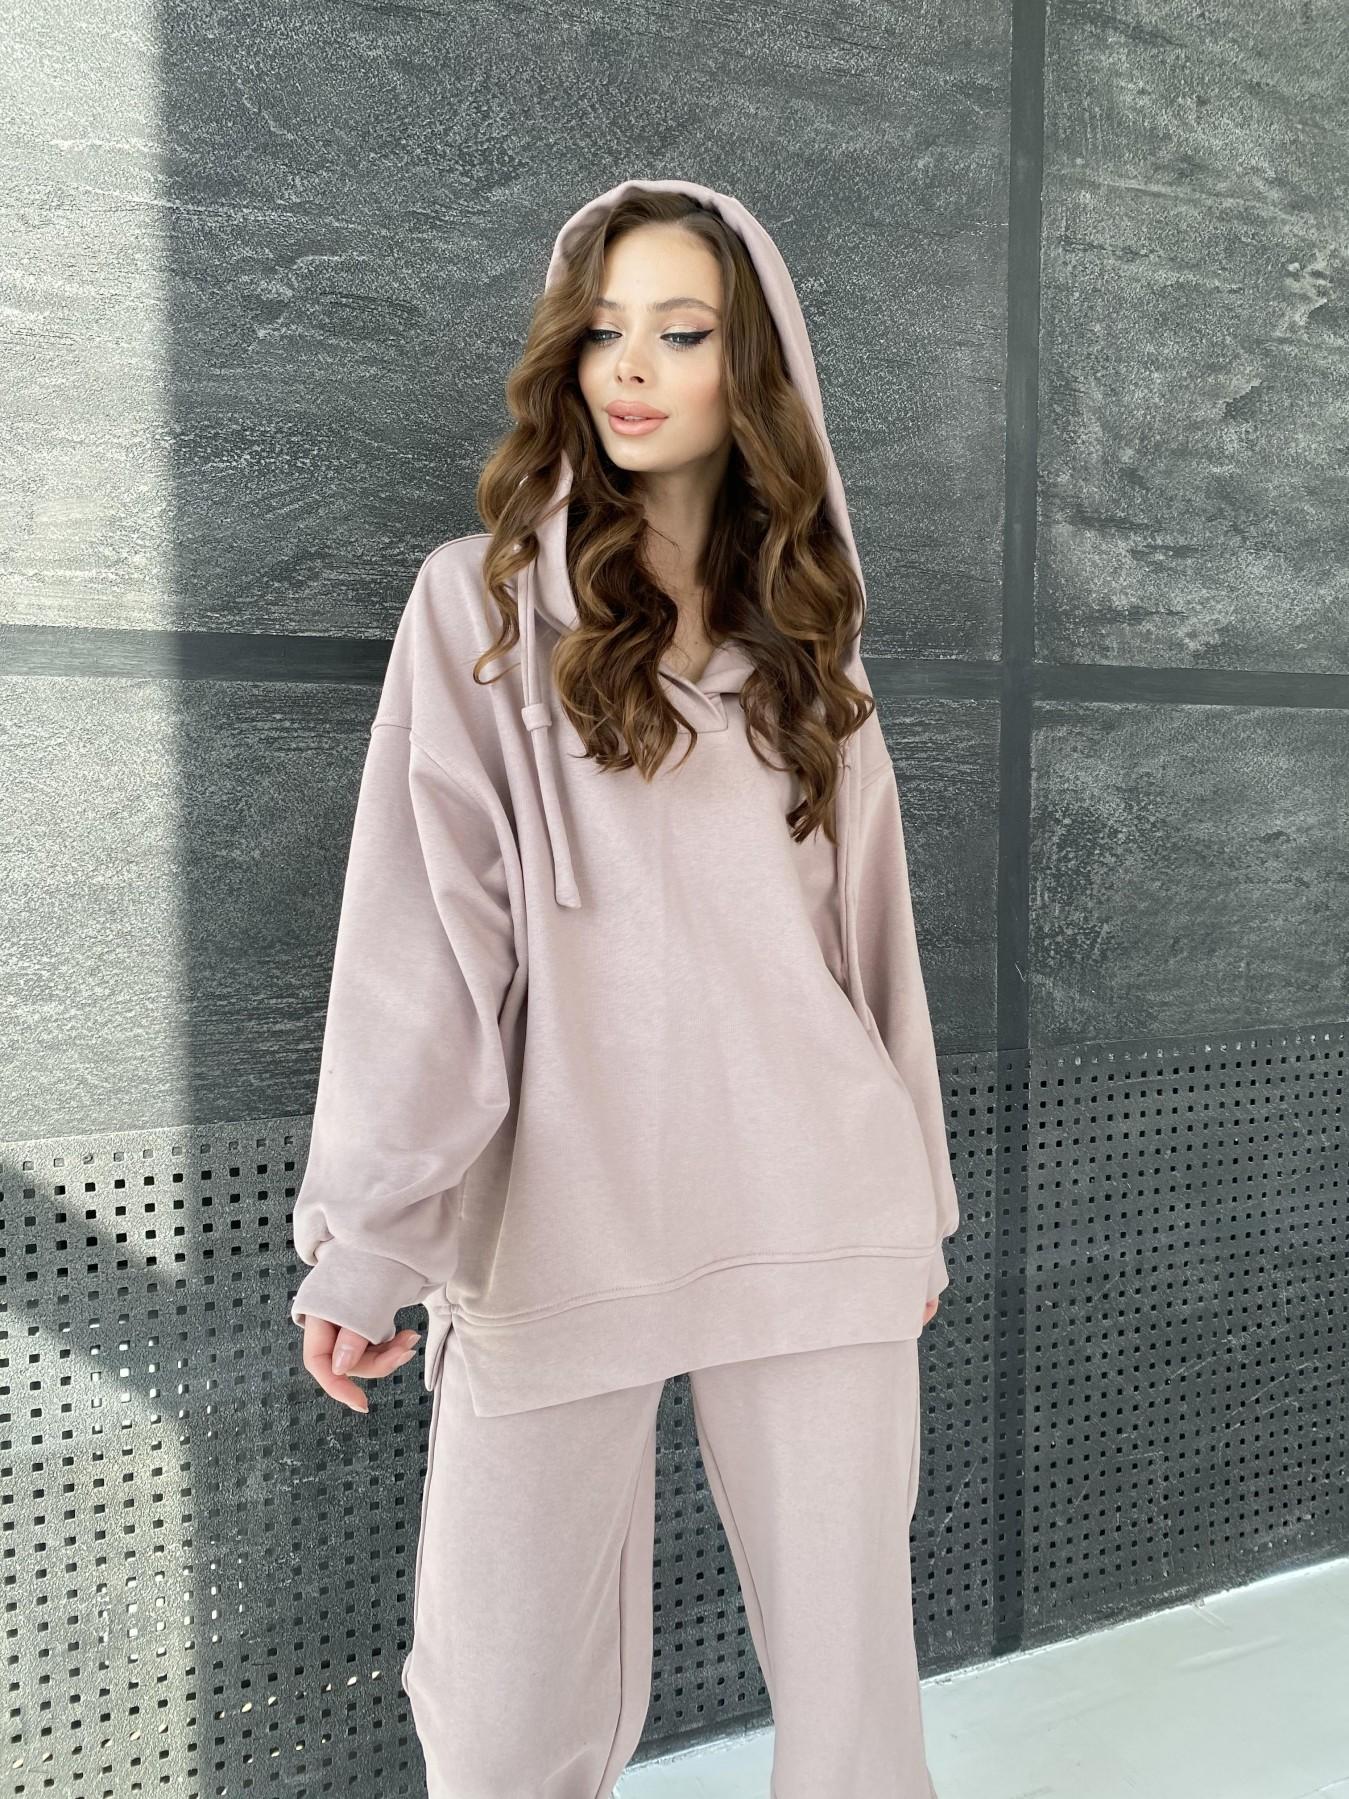 Ярис костюм из 3х нитки 10789 АРТ. 47263 Цвет: Кофе - фото 2, интернет магазин tm-modus.ru